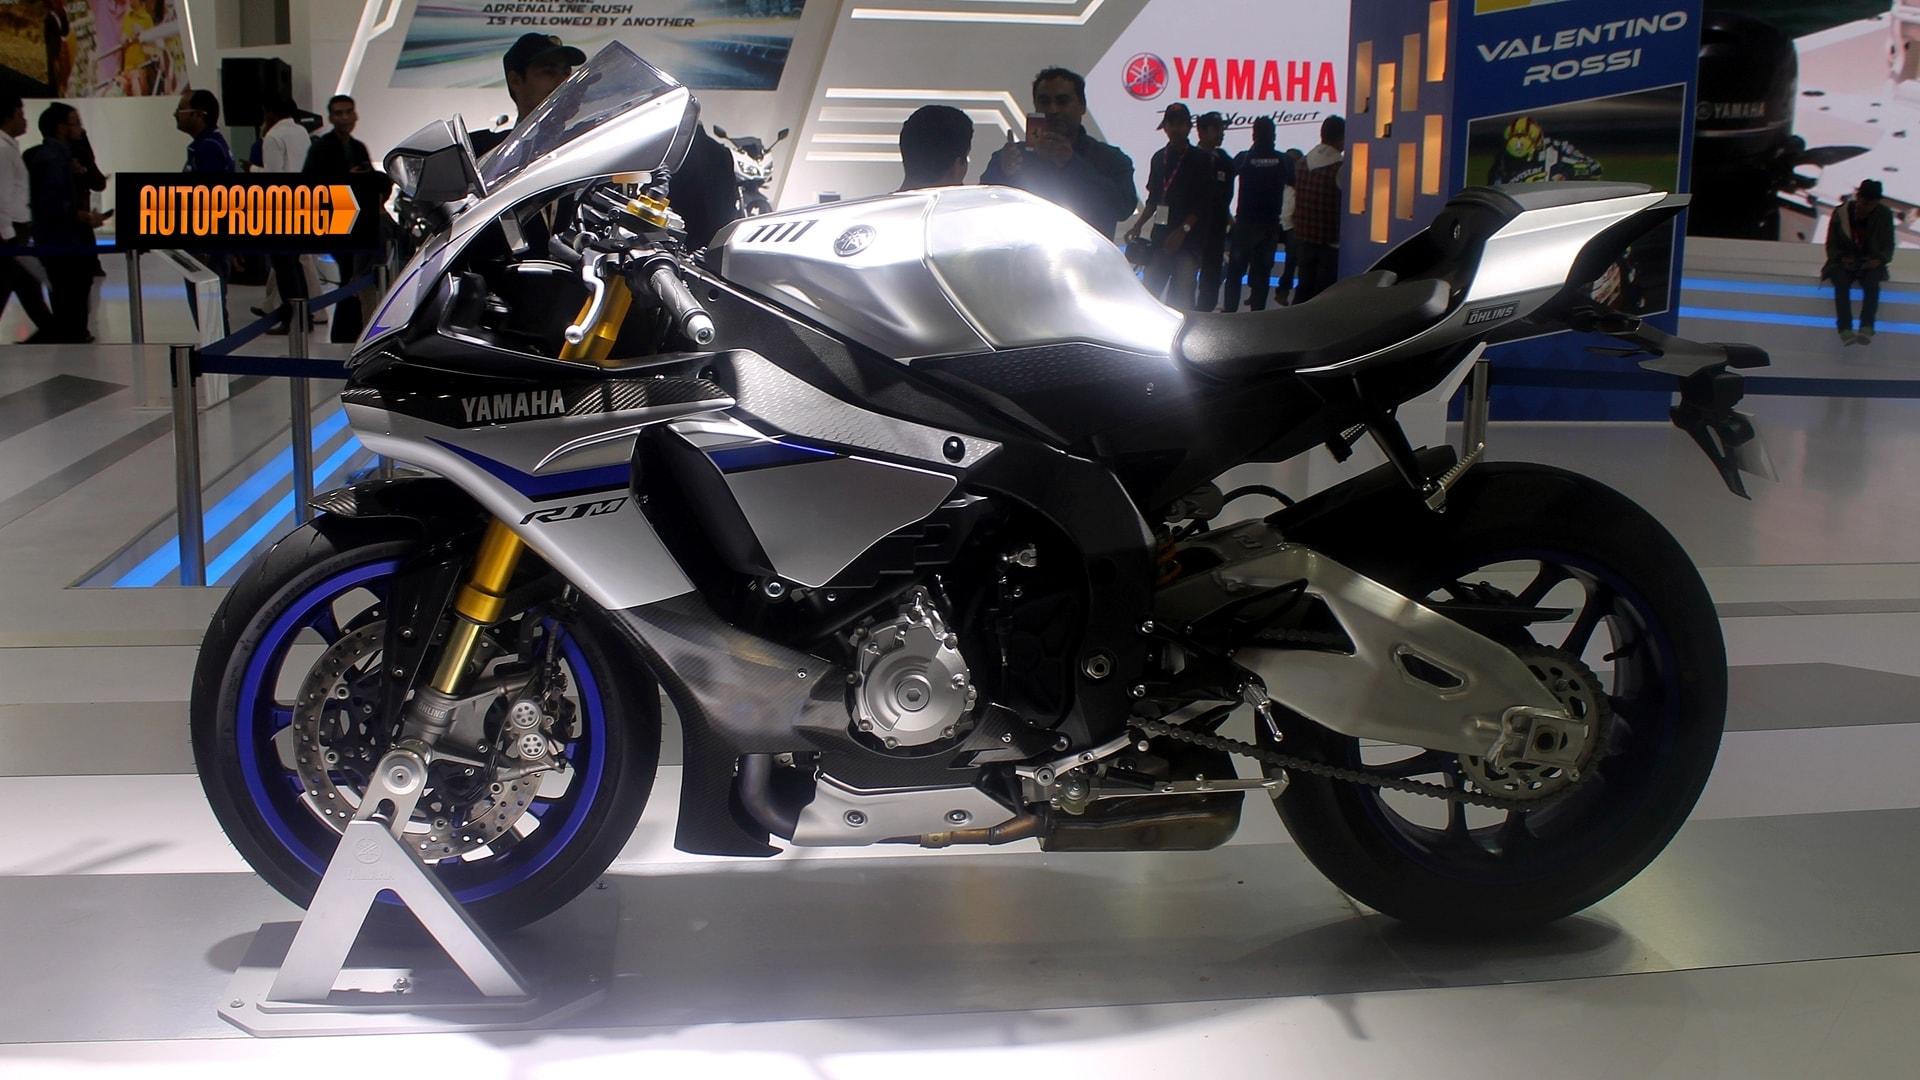 Yamaha r3 india launch price pics specs details autos post for Yamaha bikes price list